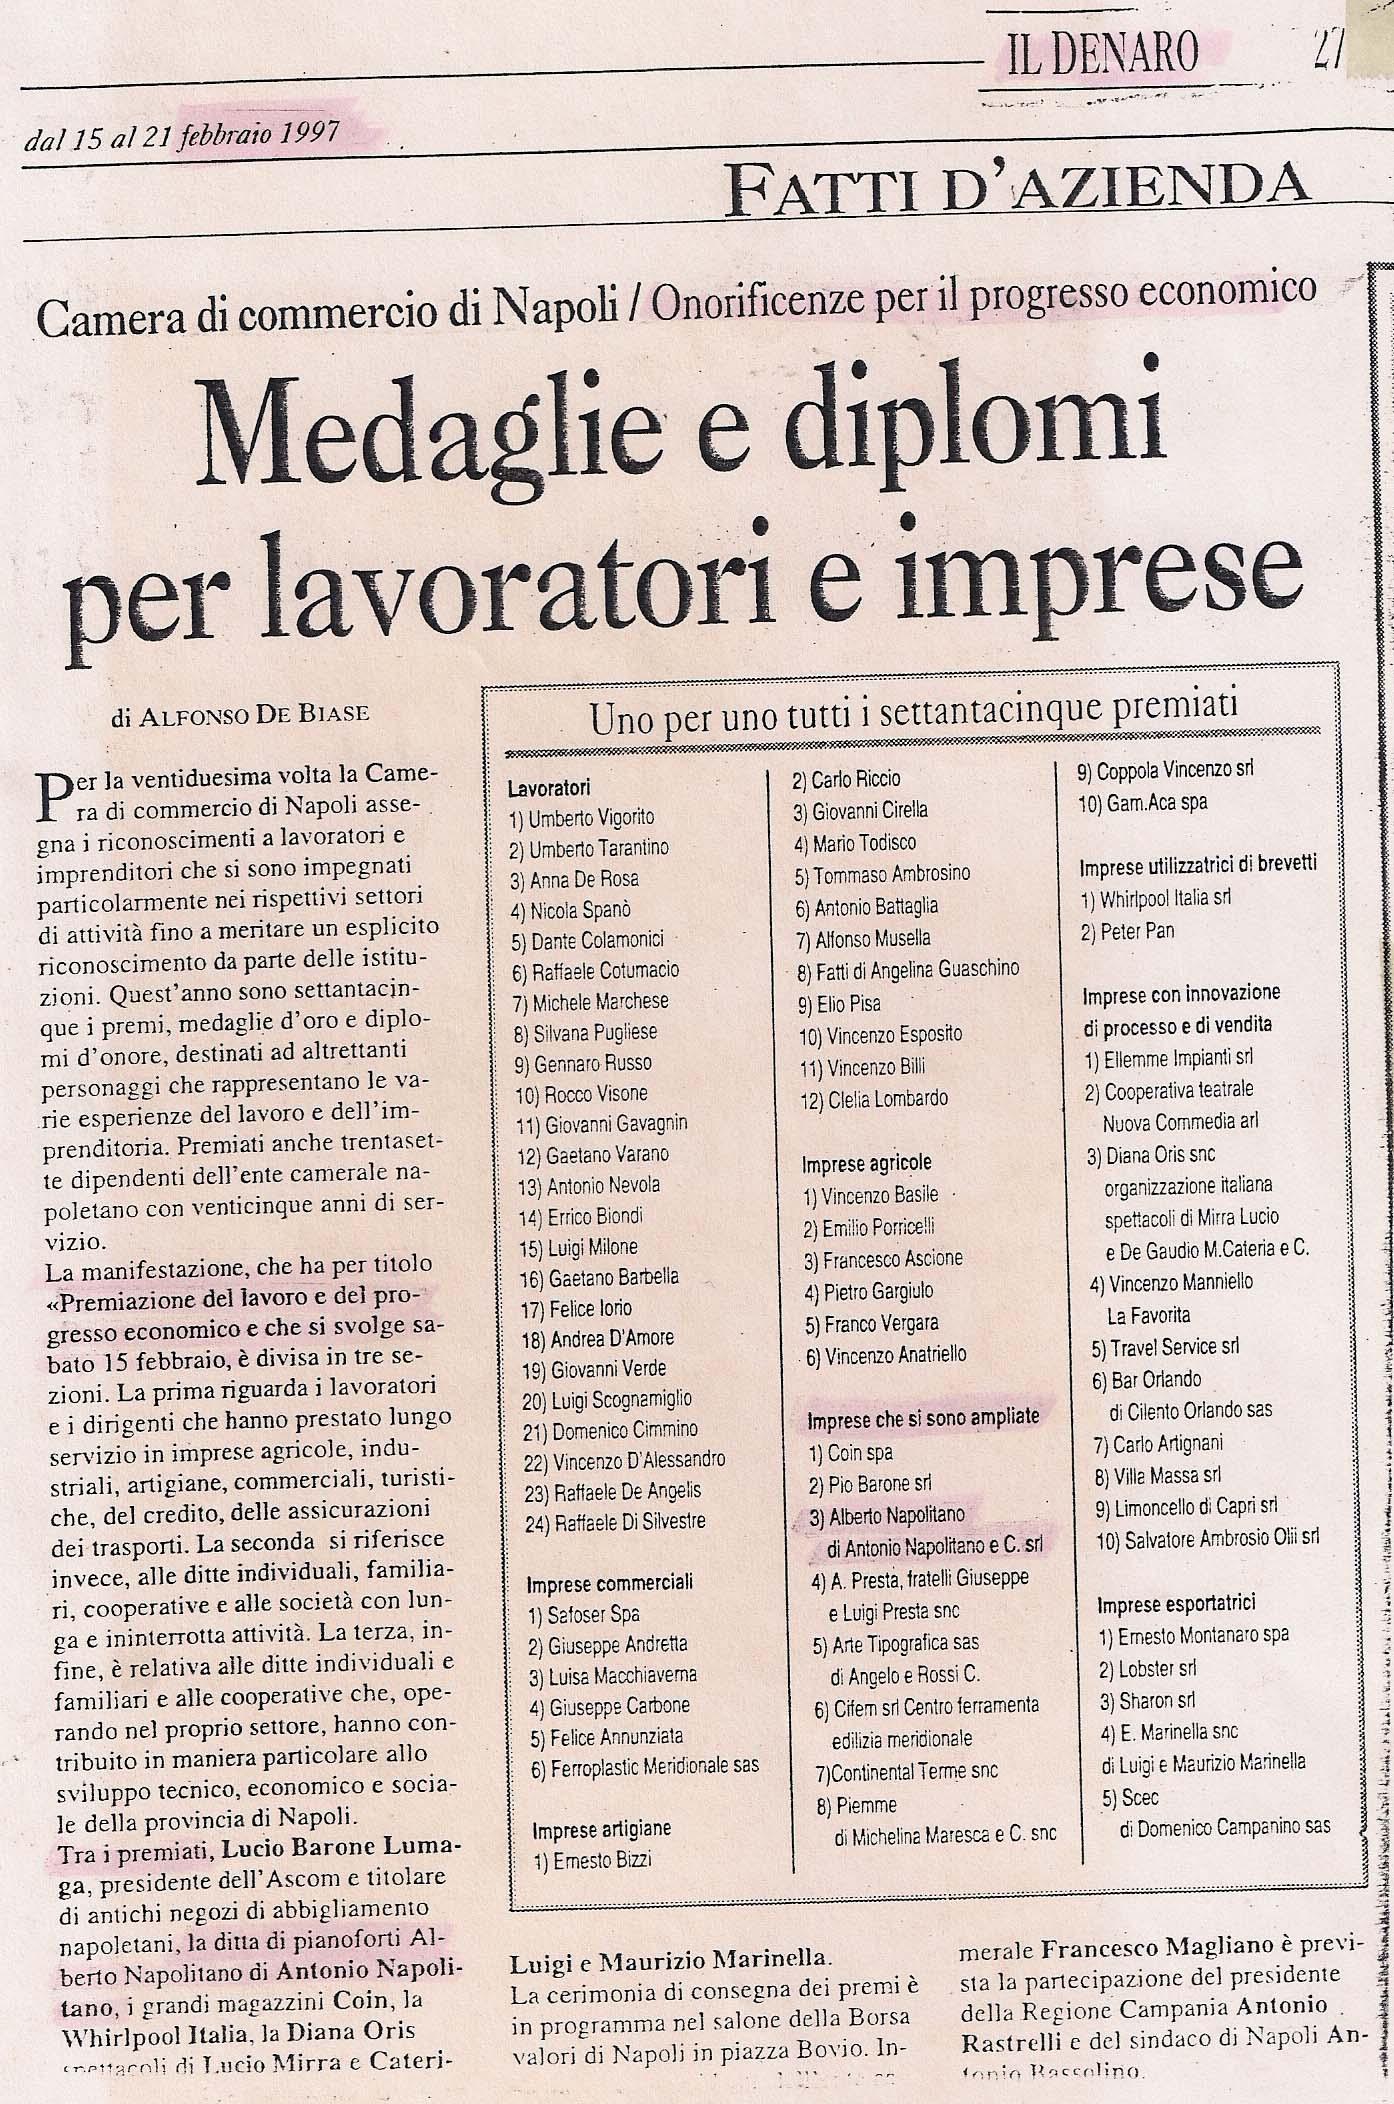 Medaglie-diplomi-1997-Alberto-Napolitano-Pianoforti-Napoli